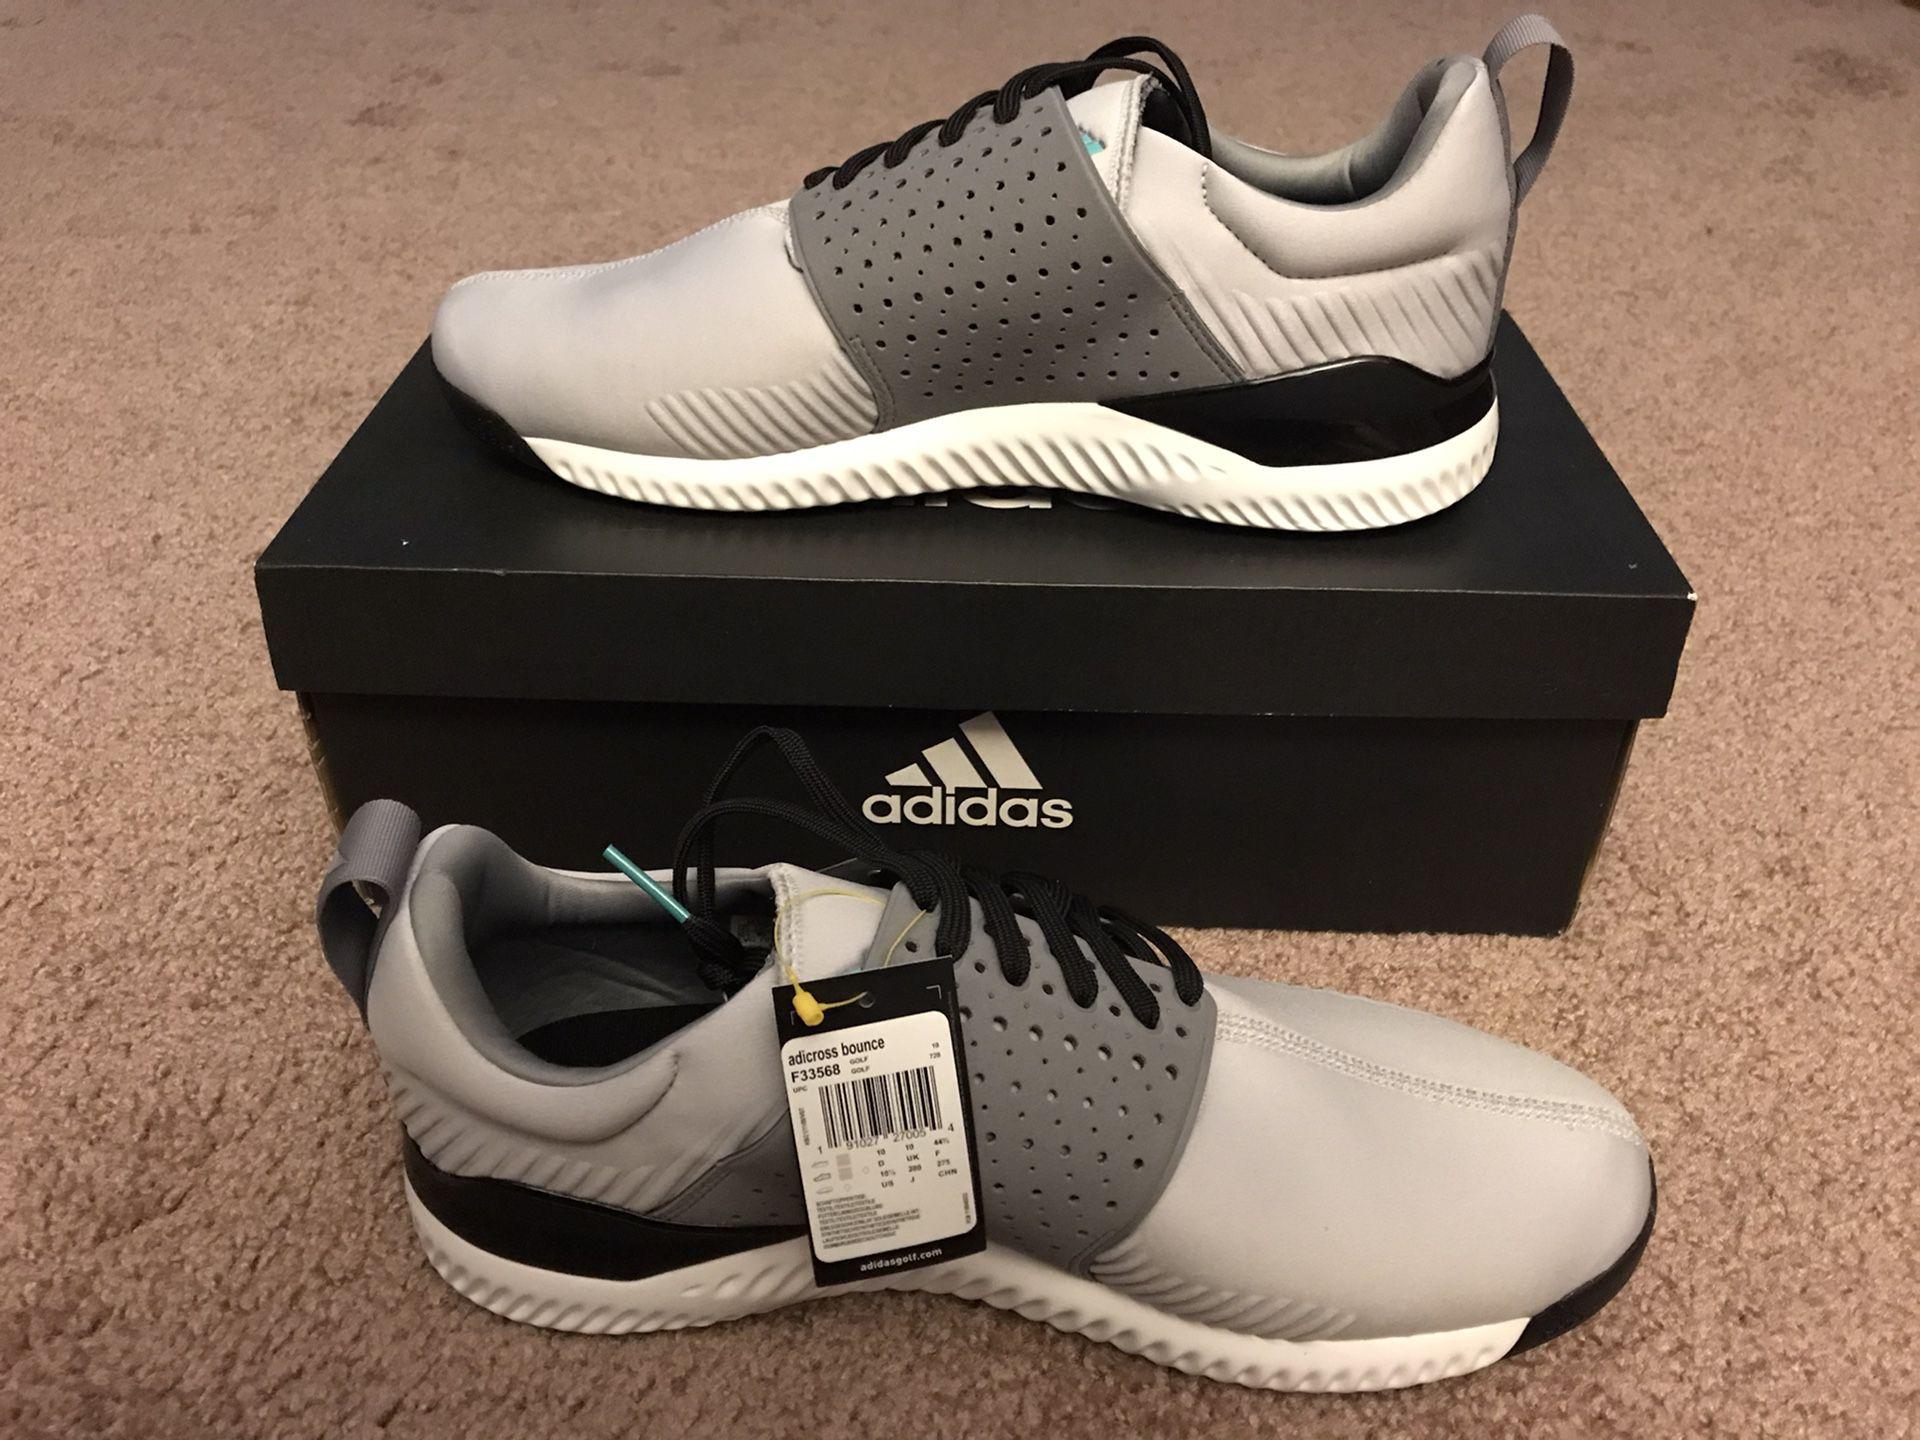 Adidas Adicross Bounce Size 10.5